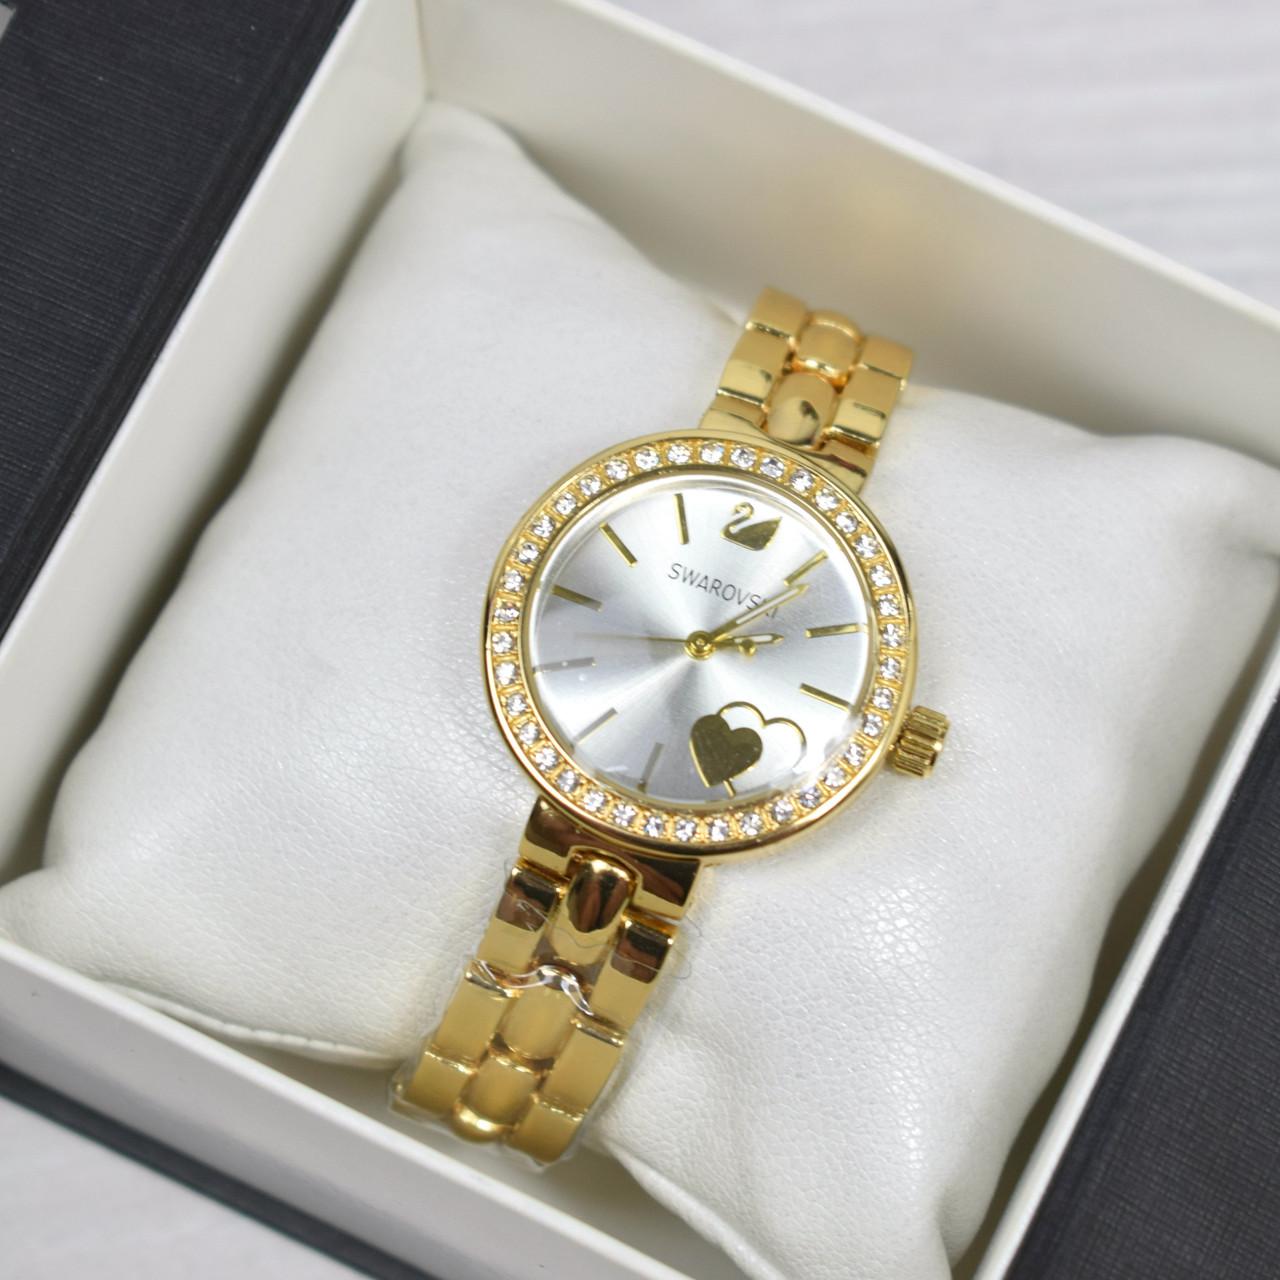 bf4eded2dee1 Часы женские наручные Swarovski золото, часы дропшиппинг - Интернет -  магазин MaxTrade в Днепре